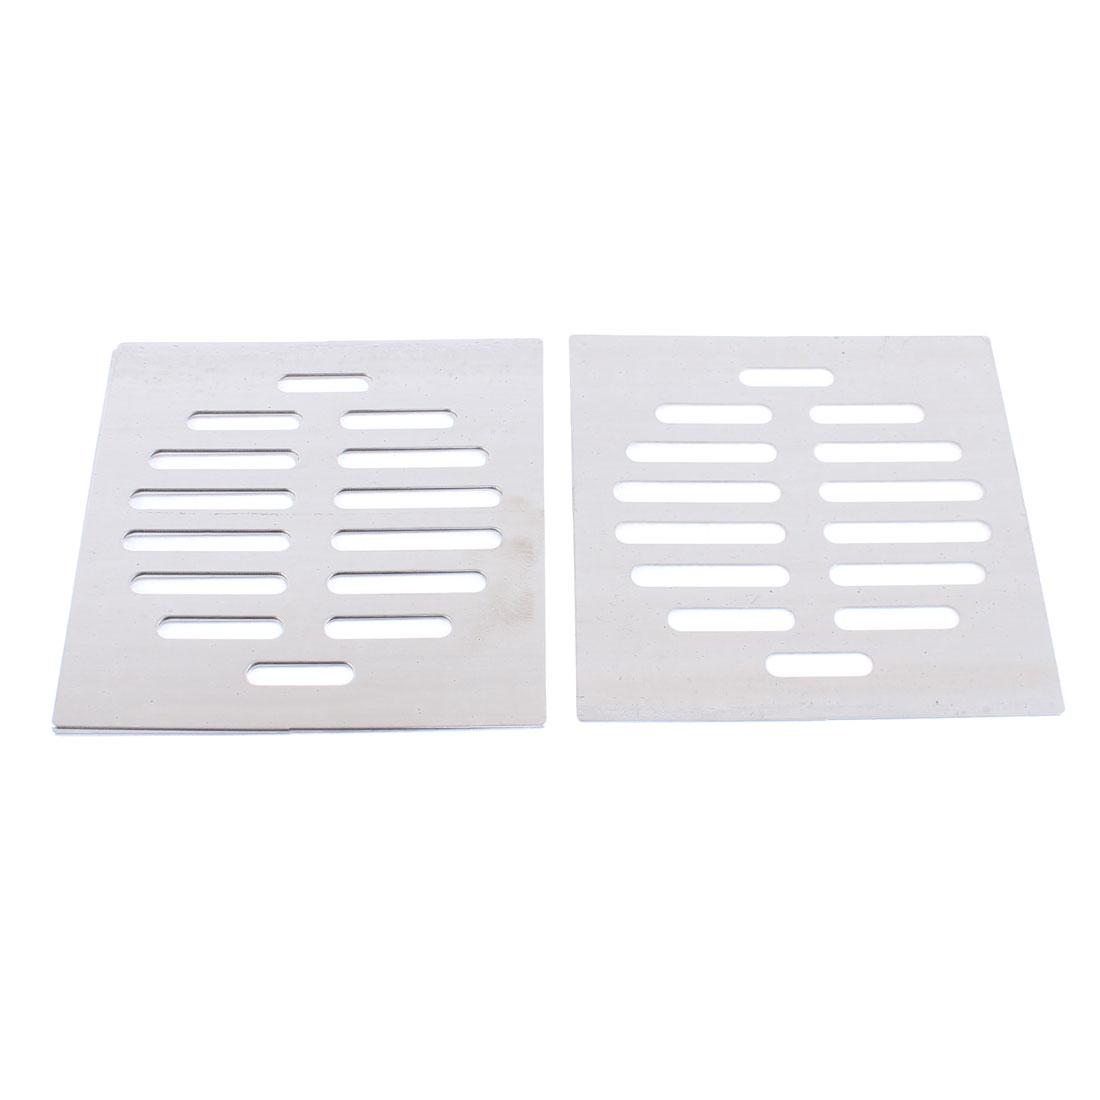 "Stainless Steel Kitchen Bathroom Square Floor Drain Cover 4.4"" 11.3cm 3pcs"